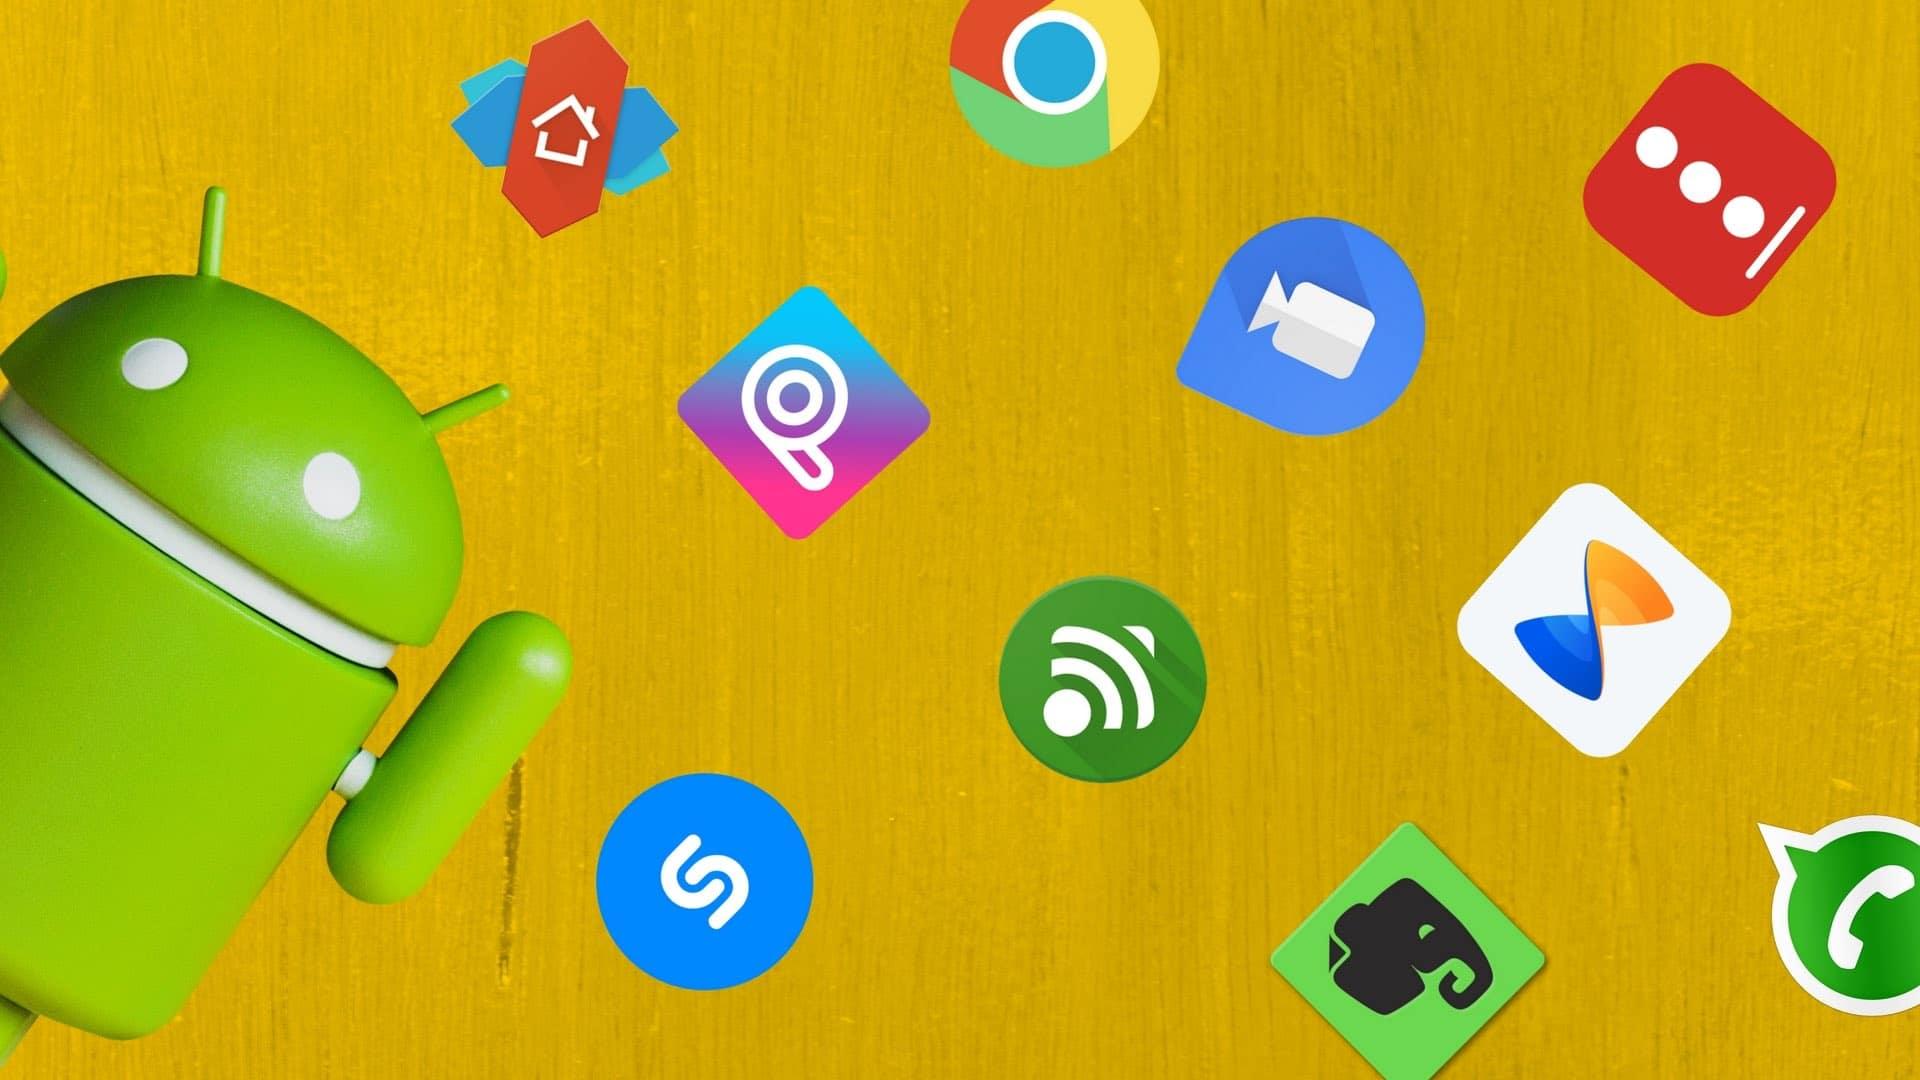 Google Play Store Hacks